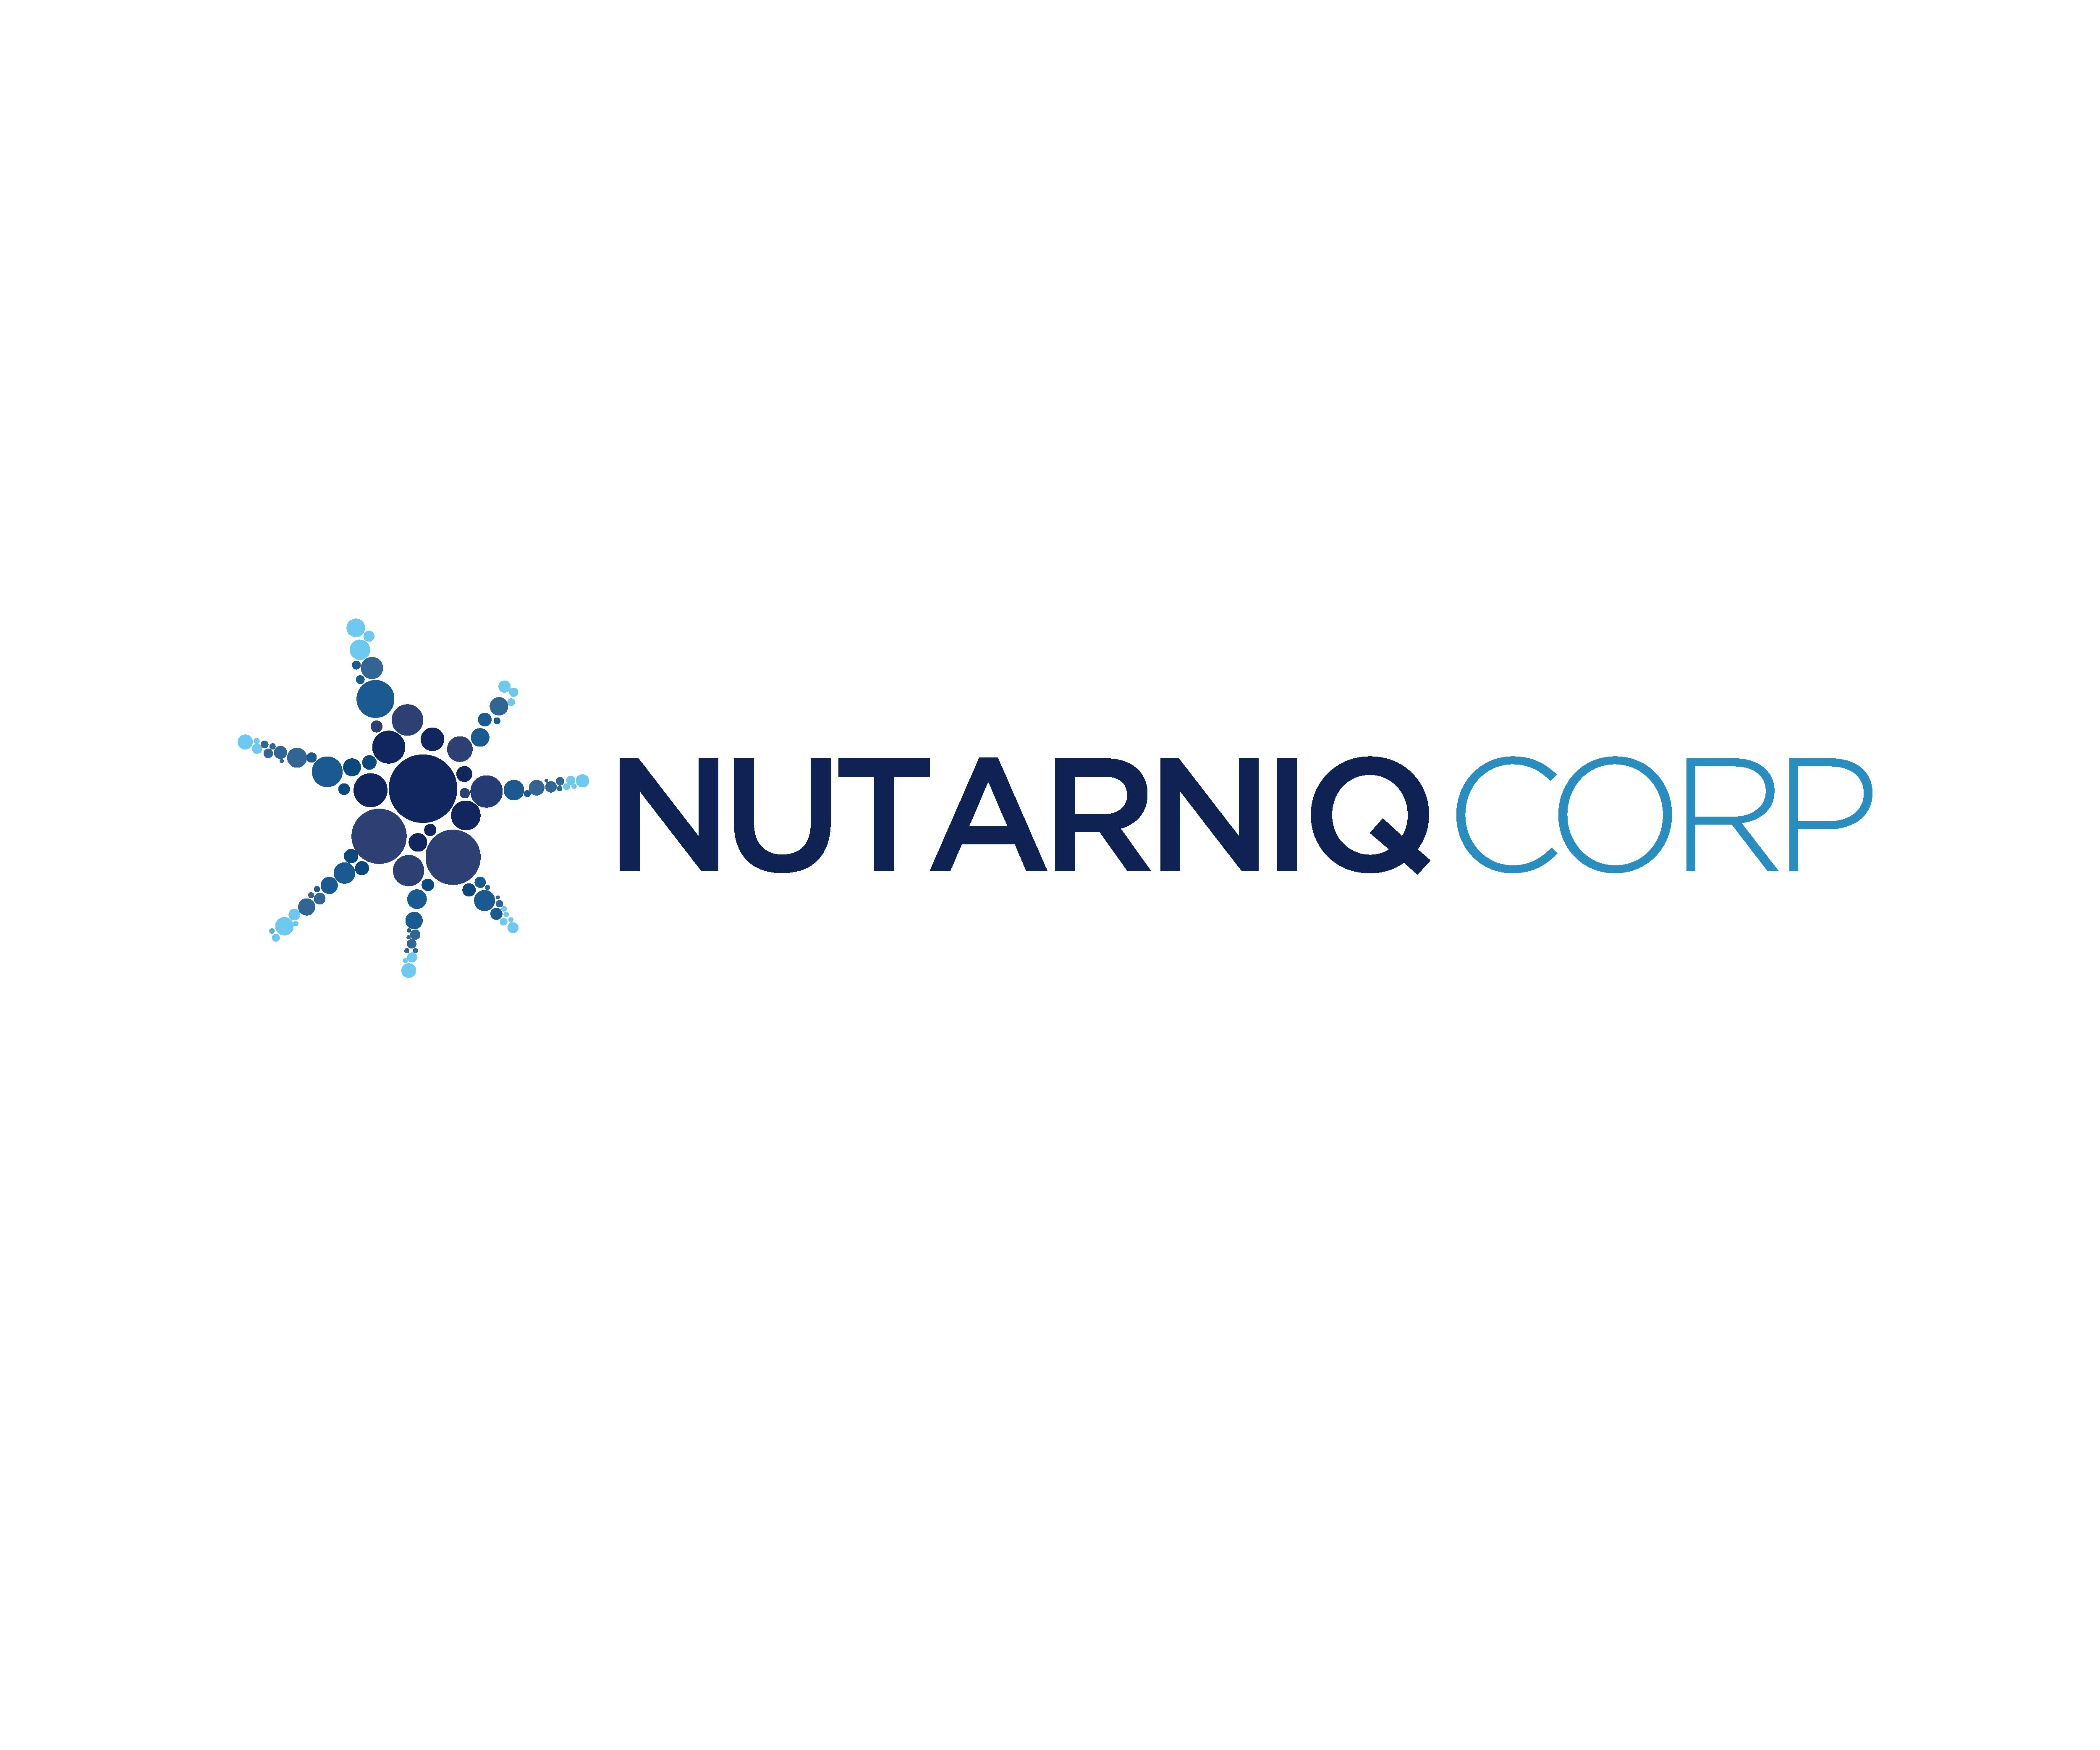 Design a nerve regeneration logo for a start-up biotech company